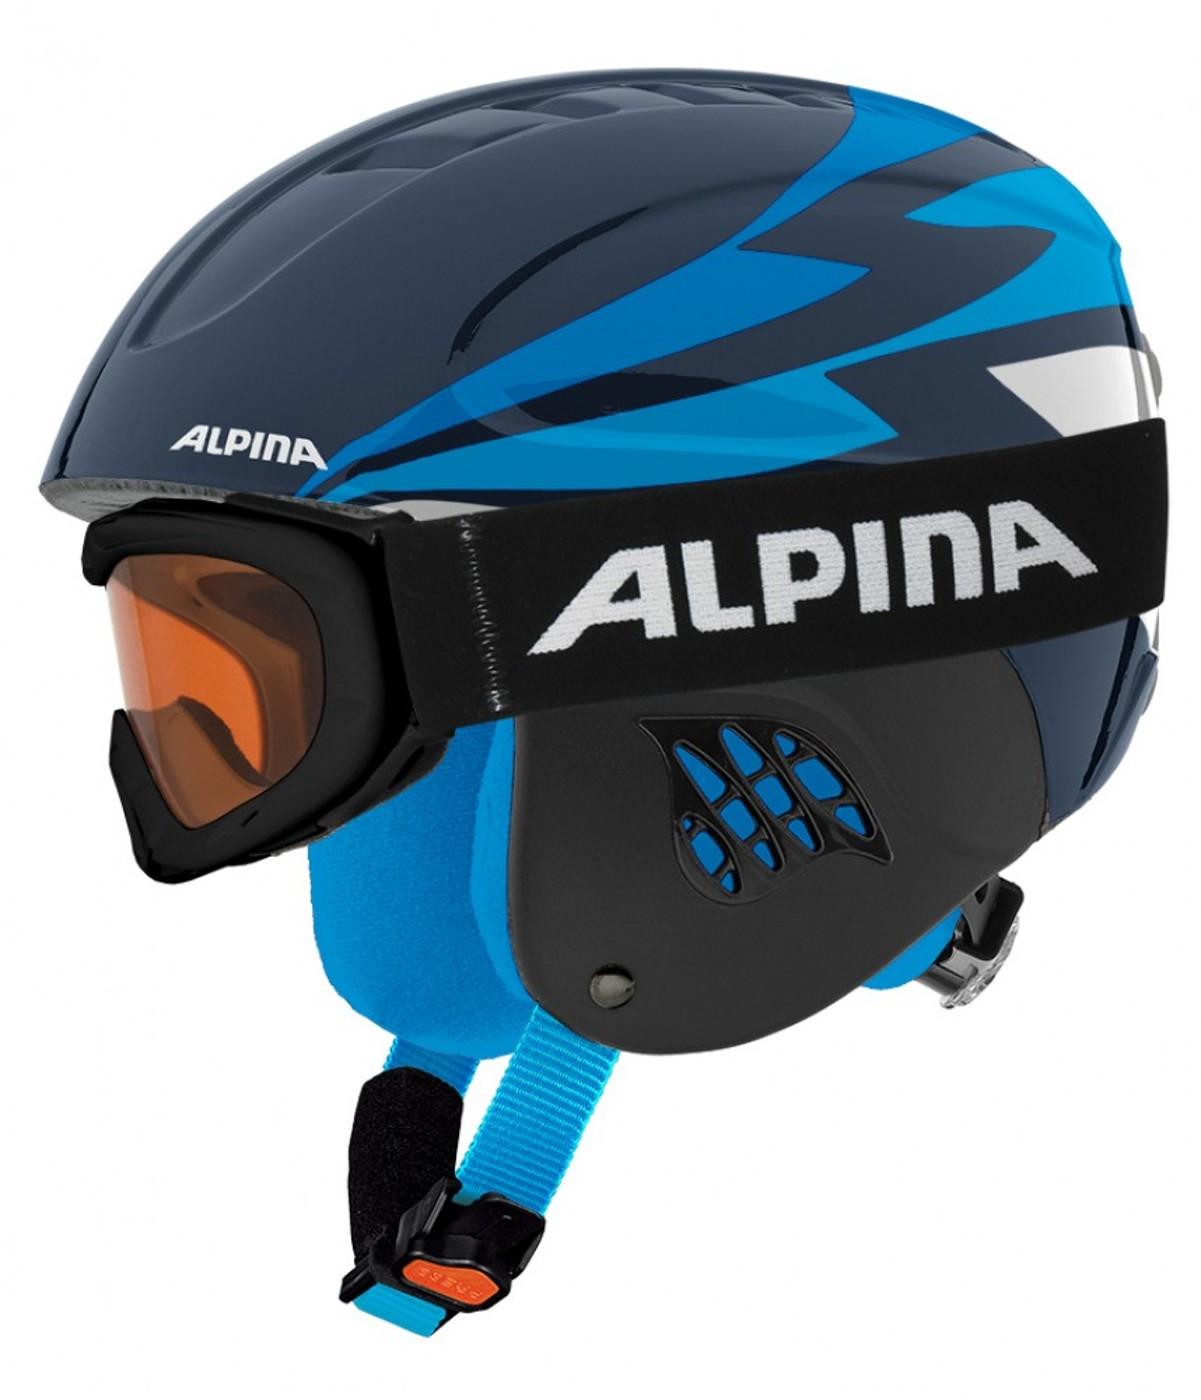 ALPINA Helm-Set CARAT mit Ruby S